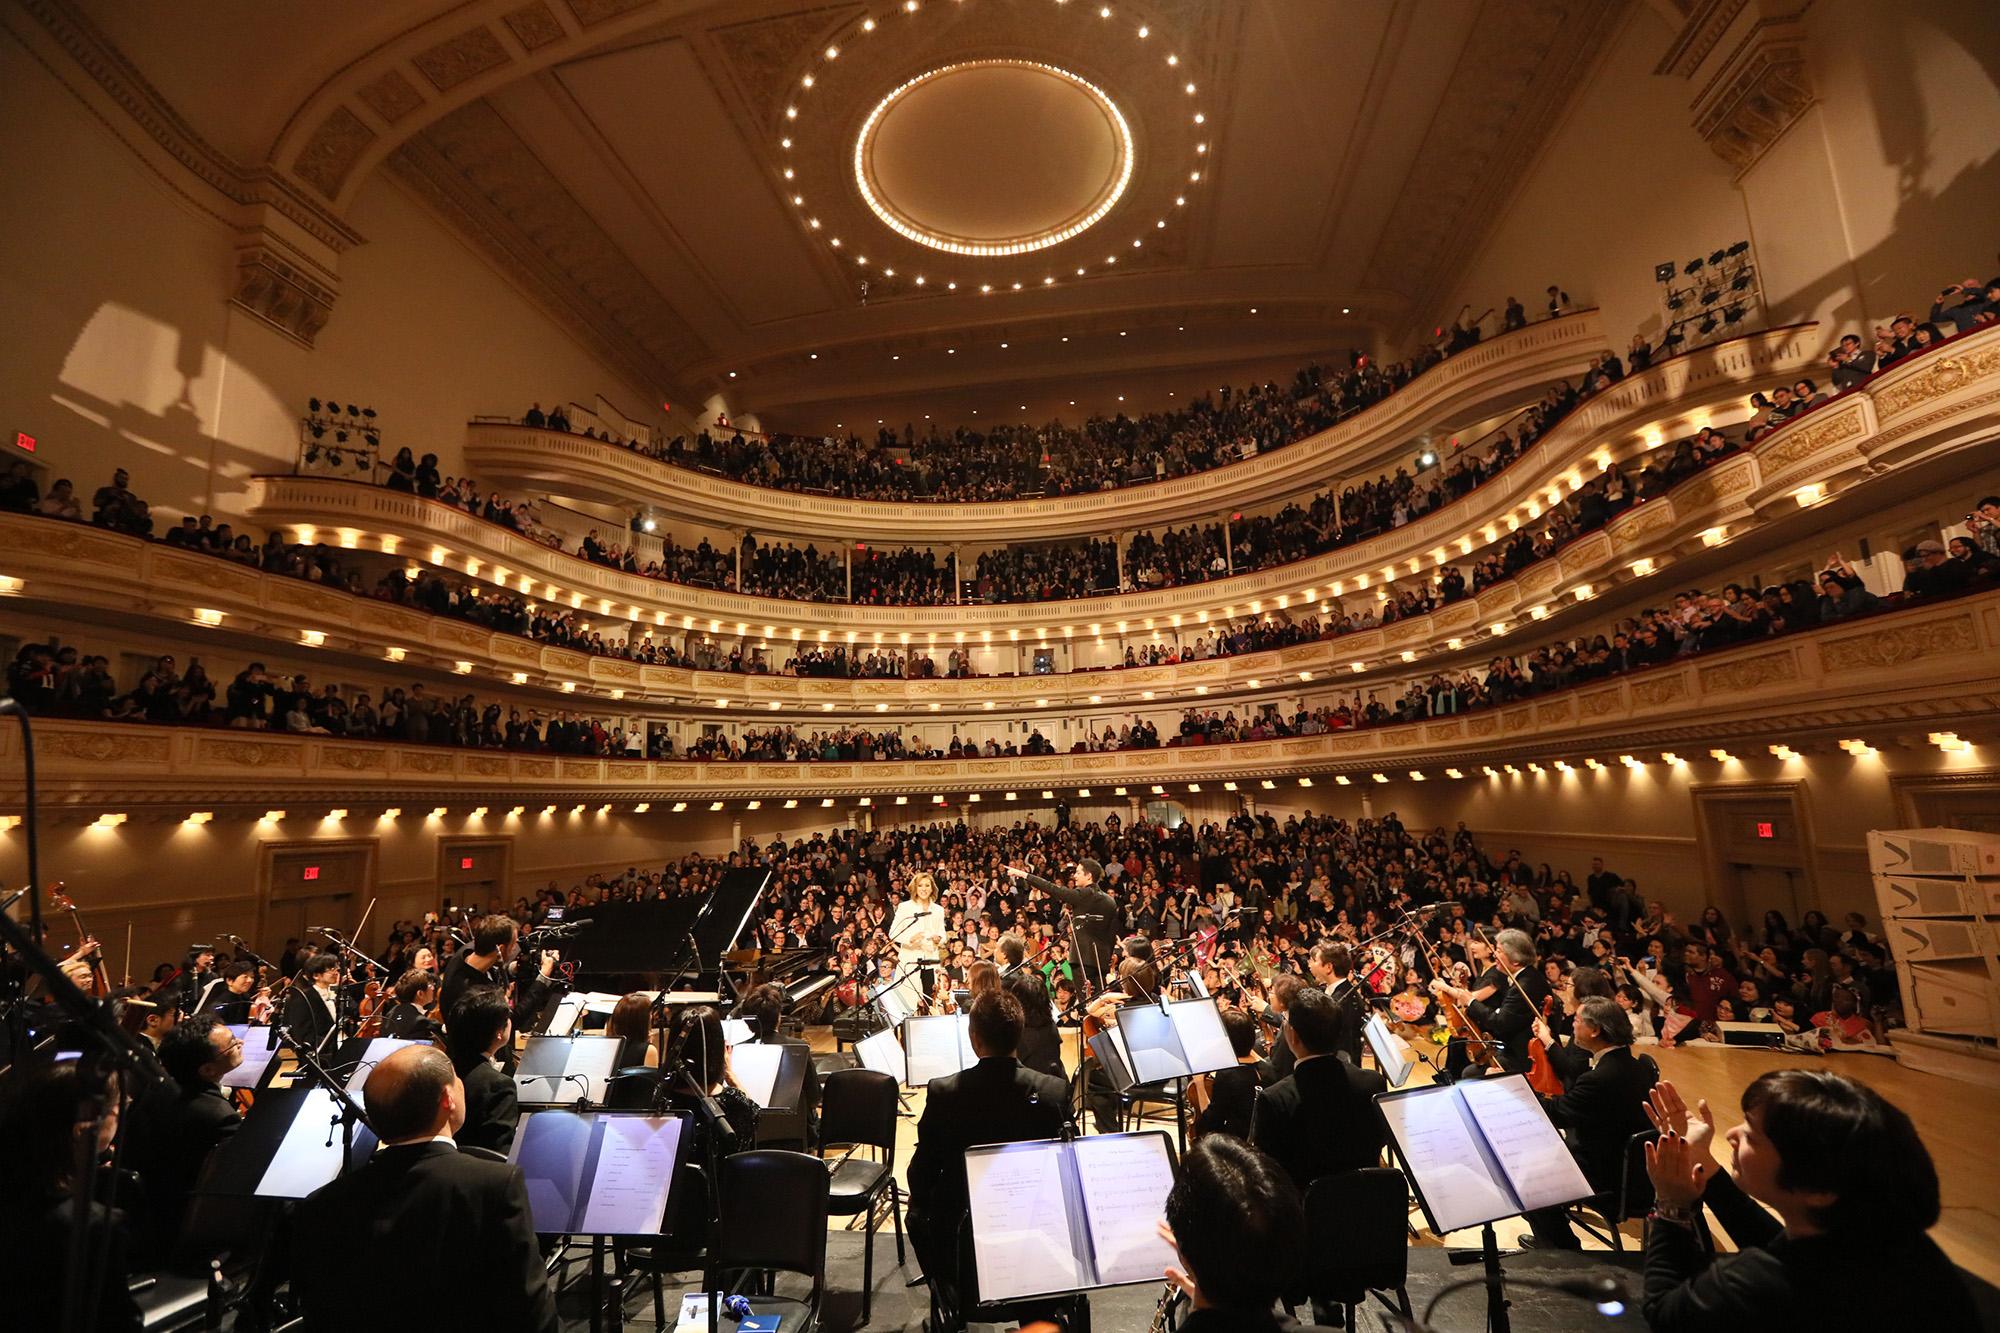 JRock247-Yoshiki-Carnegie-Hall-PBS-2